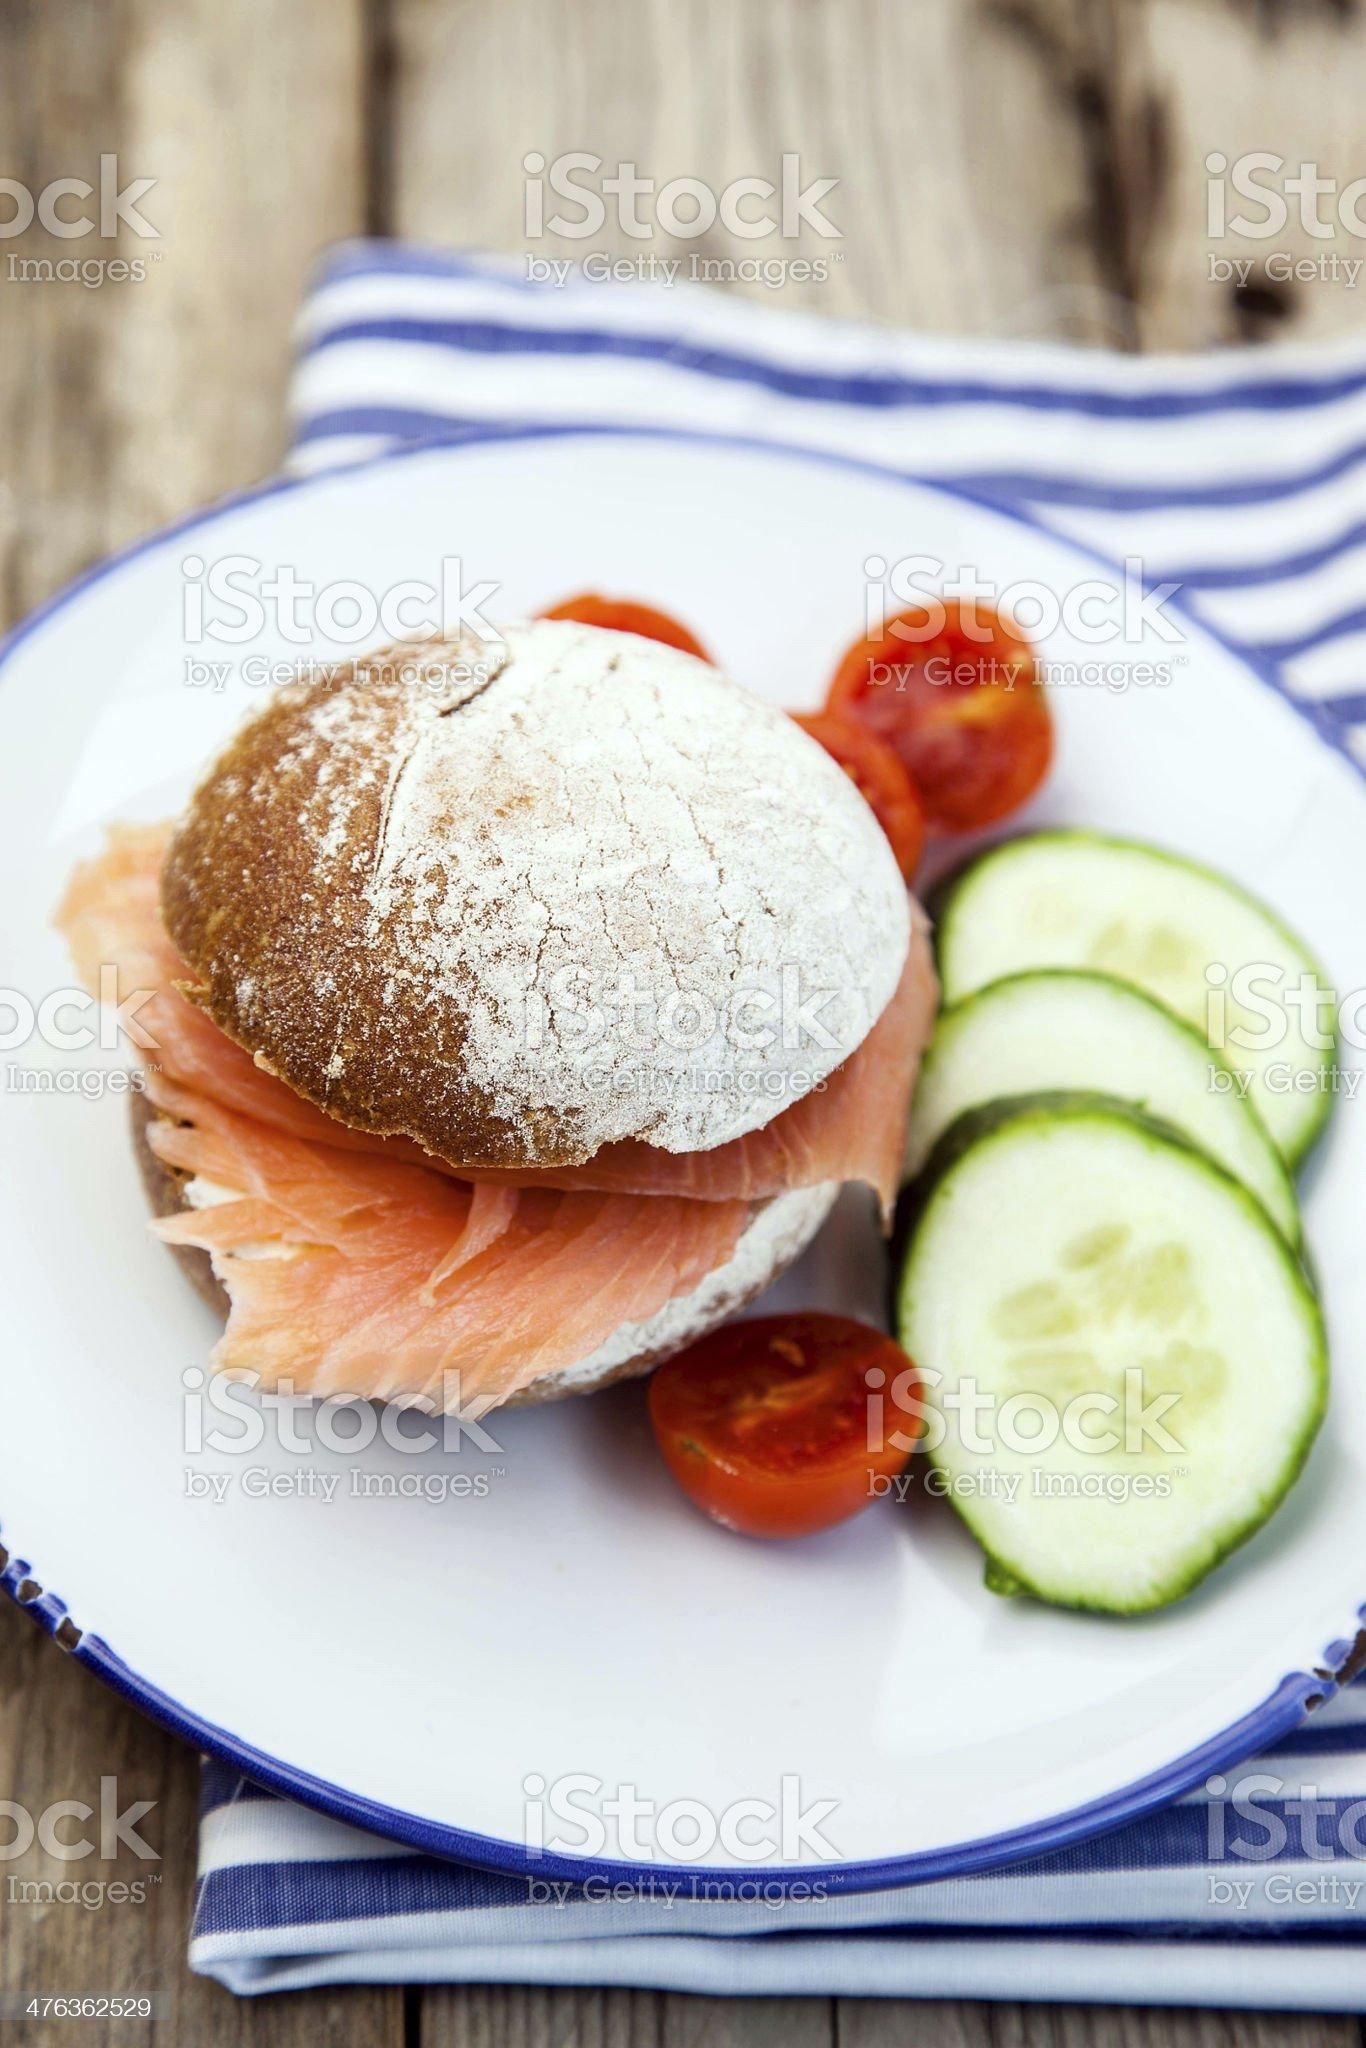 Salmon sandwich royalty-free stock photo